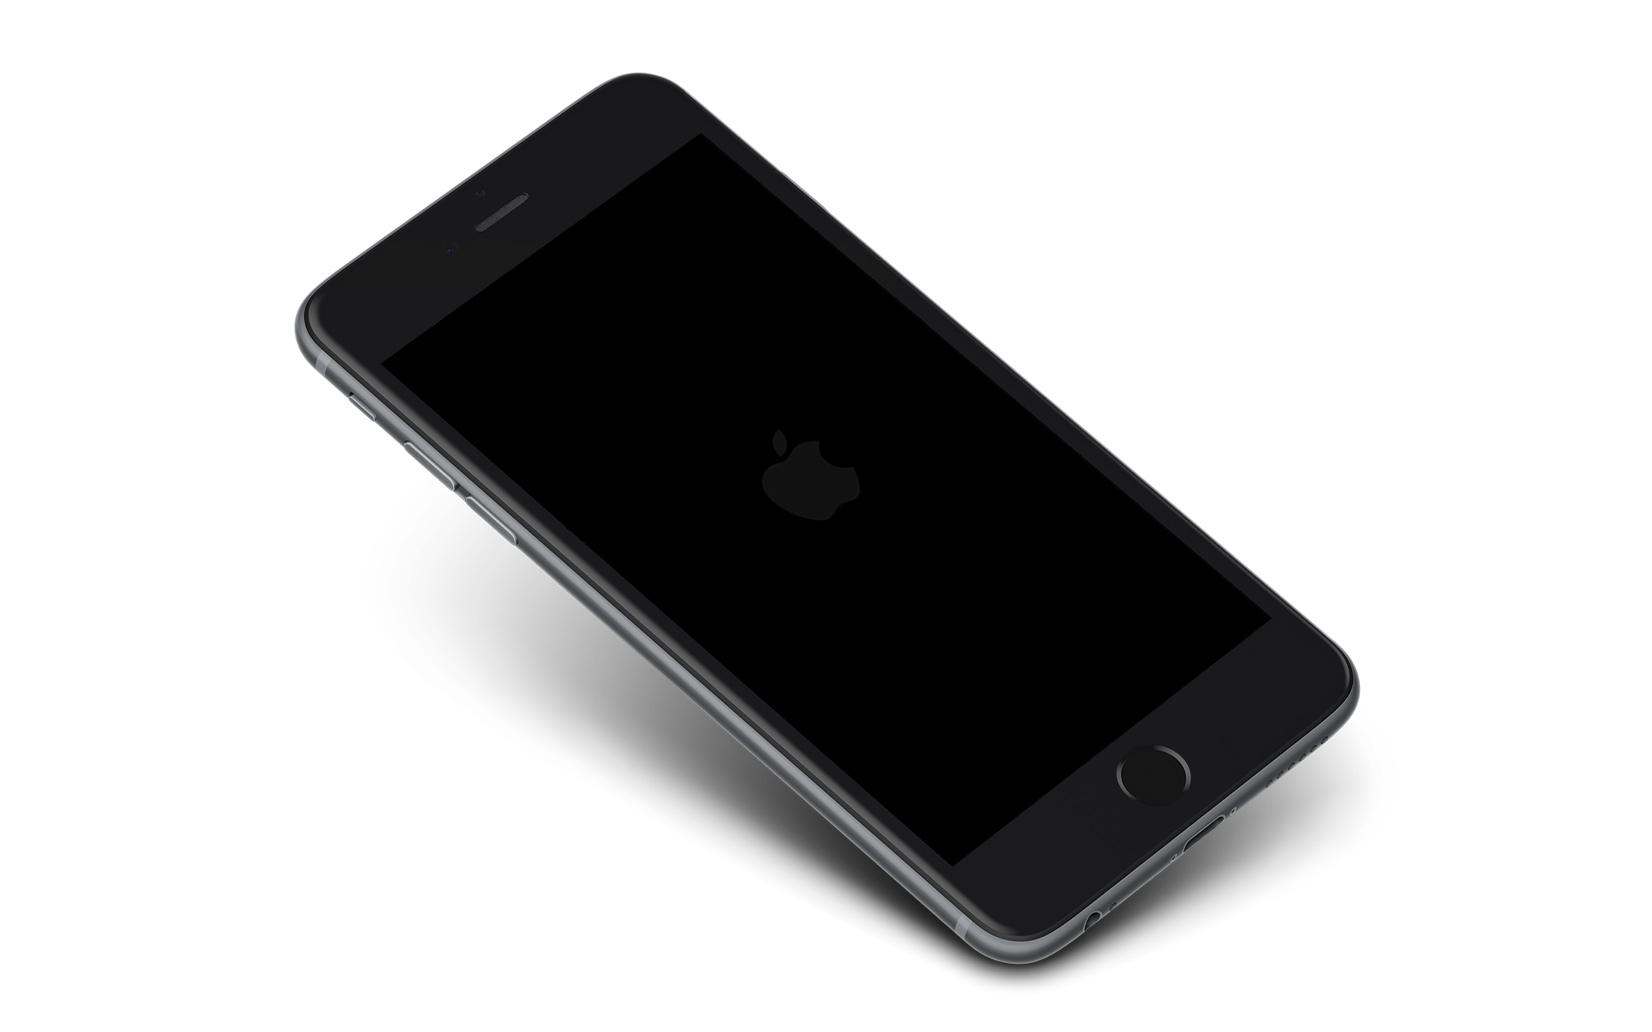 iphone 6s hintergrundbeleuchtung defekt nach reparatur idoc. Black Bedroom Furniture Sets. Home Design Ideas